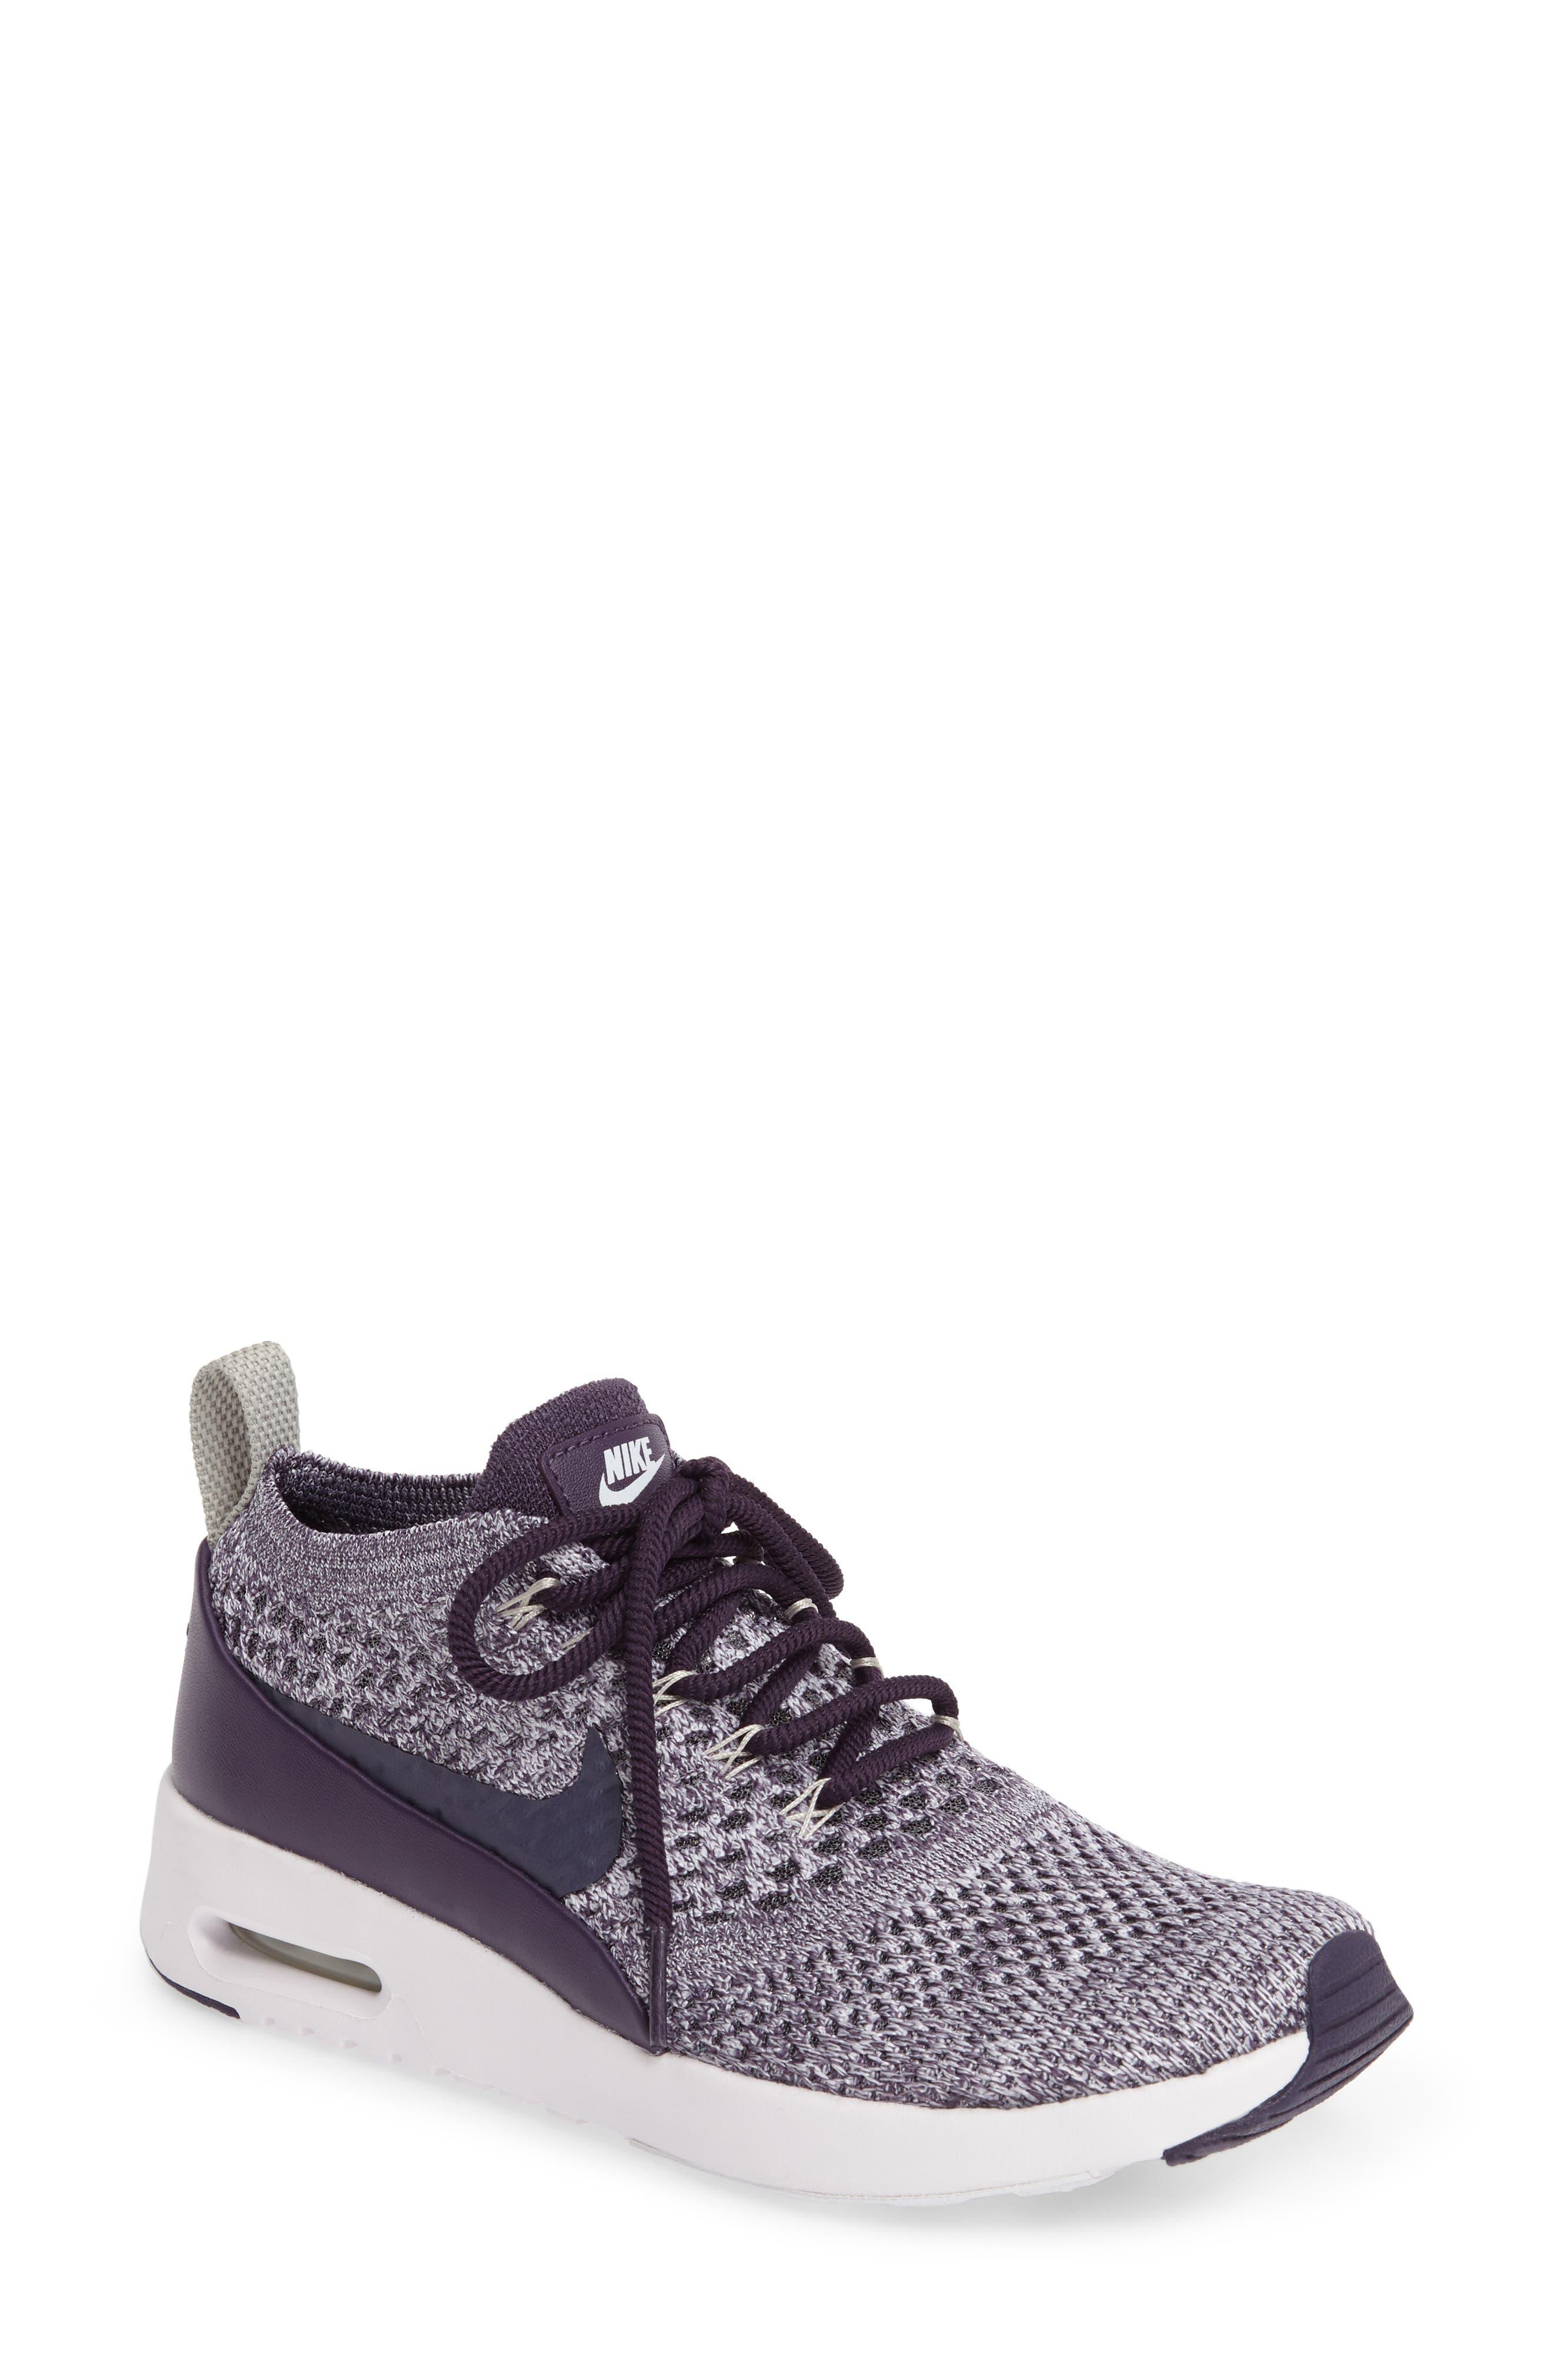 Alternate Image 1 Selected - Nike Air Max Thea Ultra Flyknit Sneaker (Women)